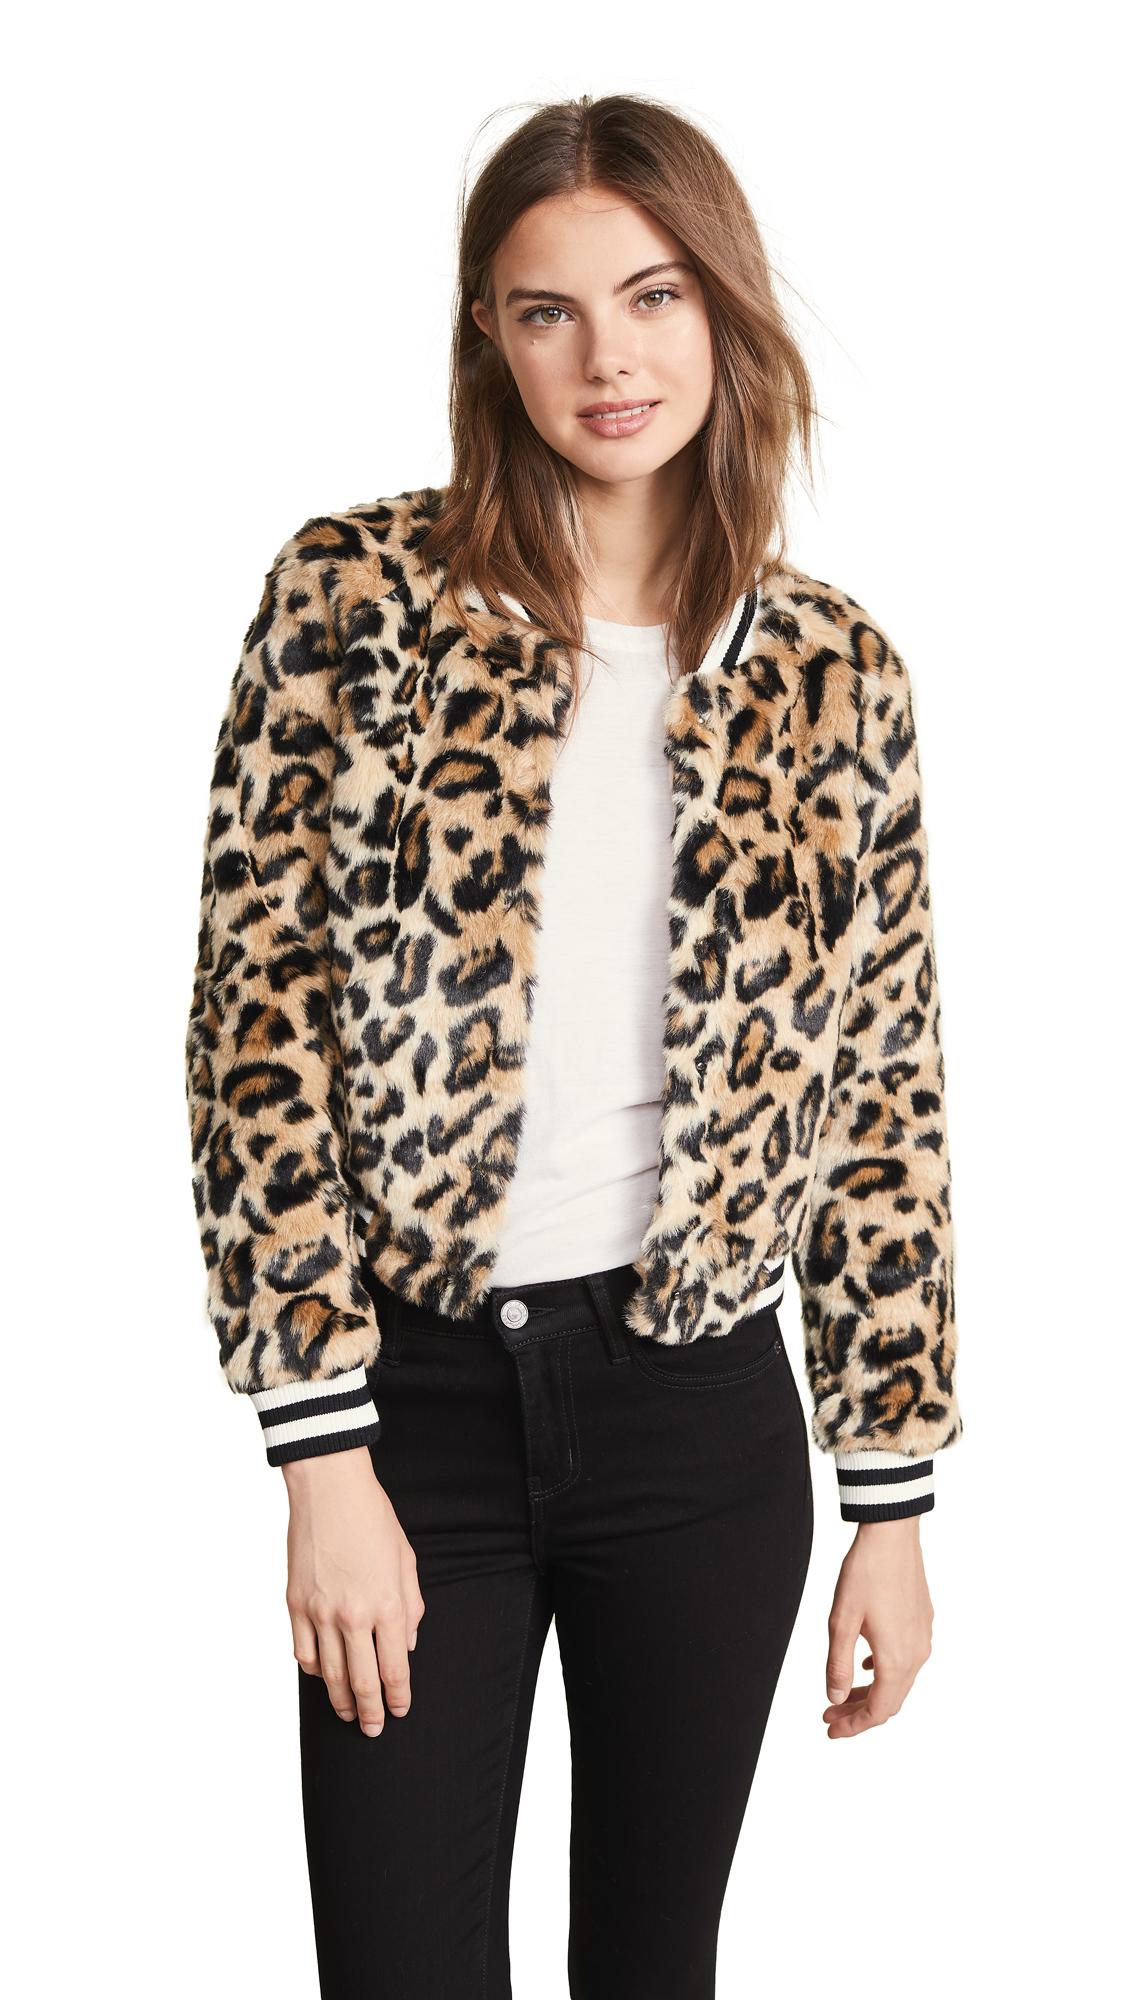 BB Dakota Jack by BB Dakota Clever Girl Leopard Faux Fur Bomber